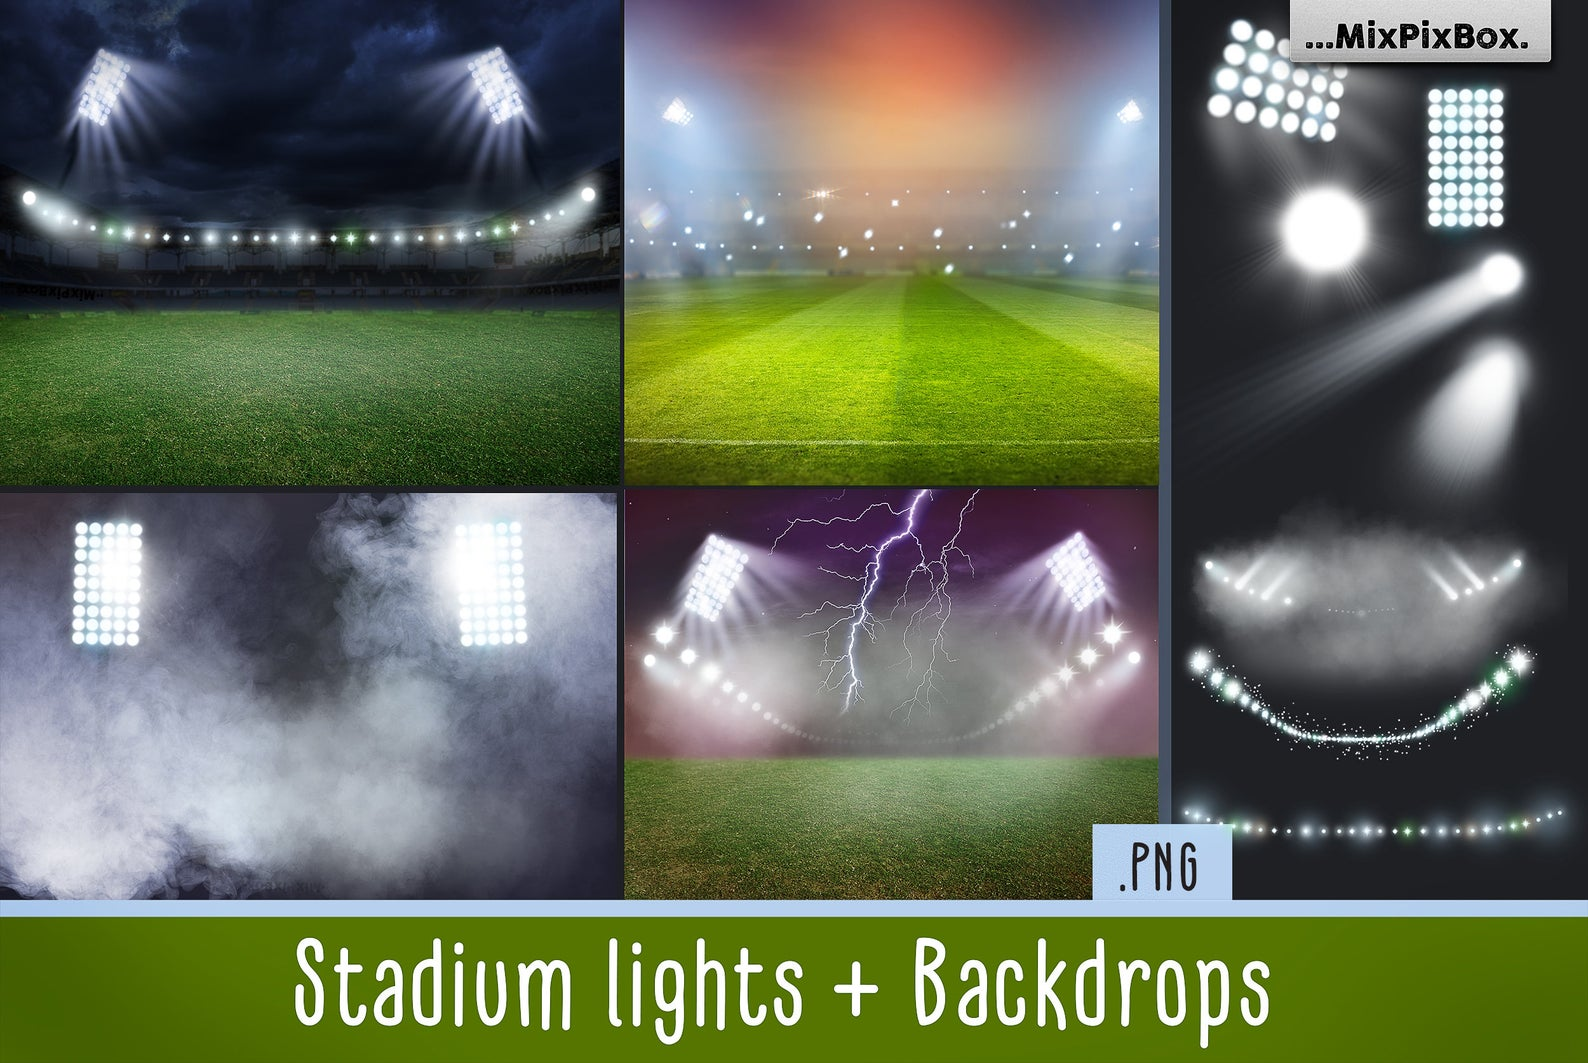 20 Stadium Lights Overlays + 6 Backdrops - stadium lights first image